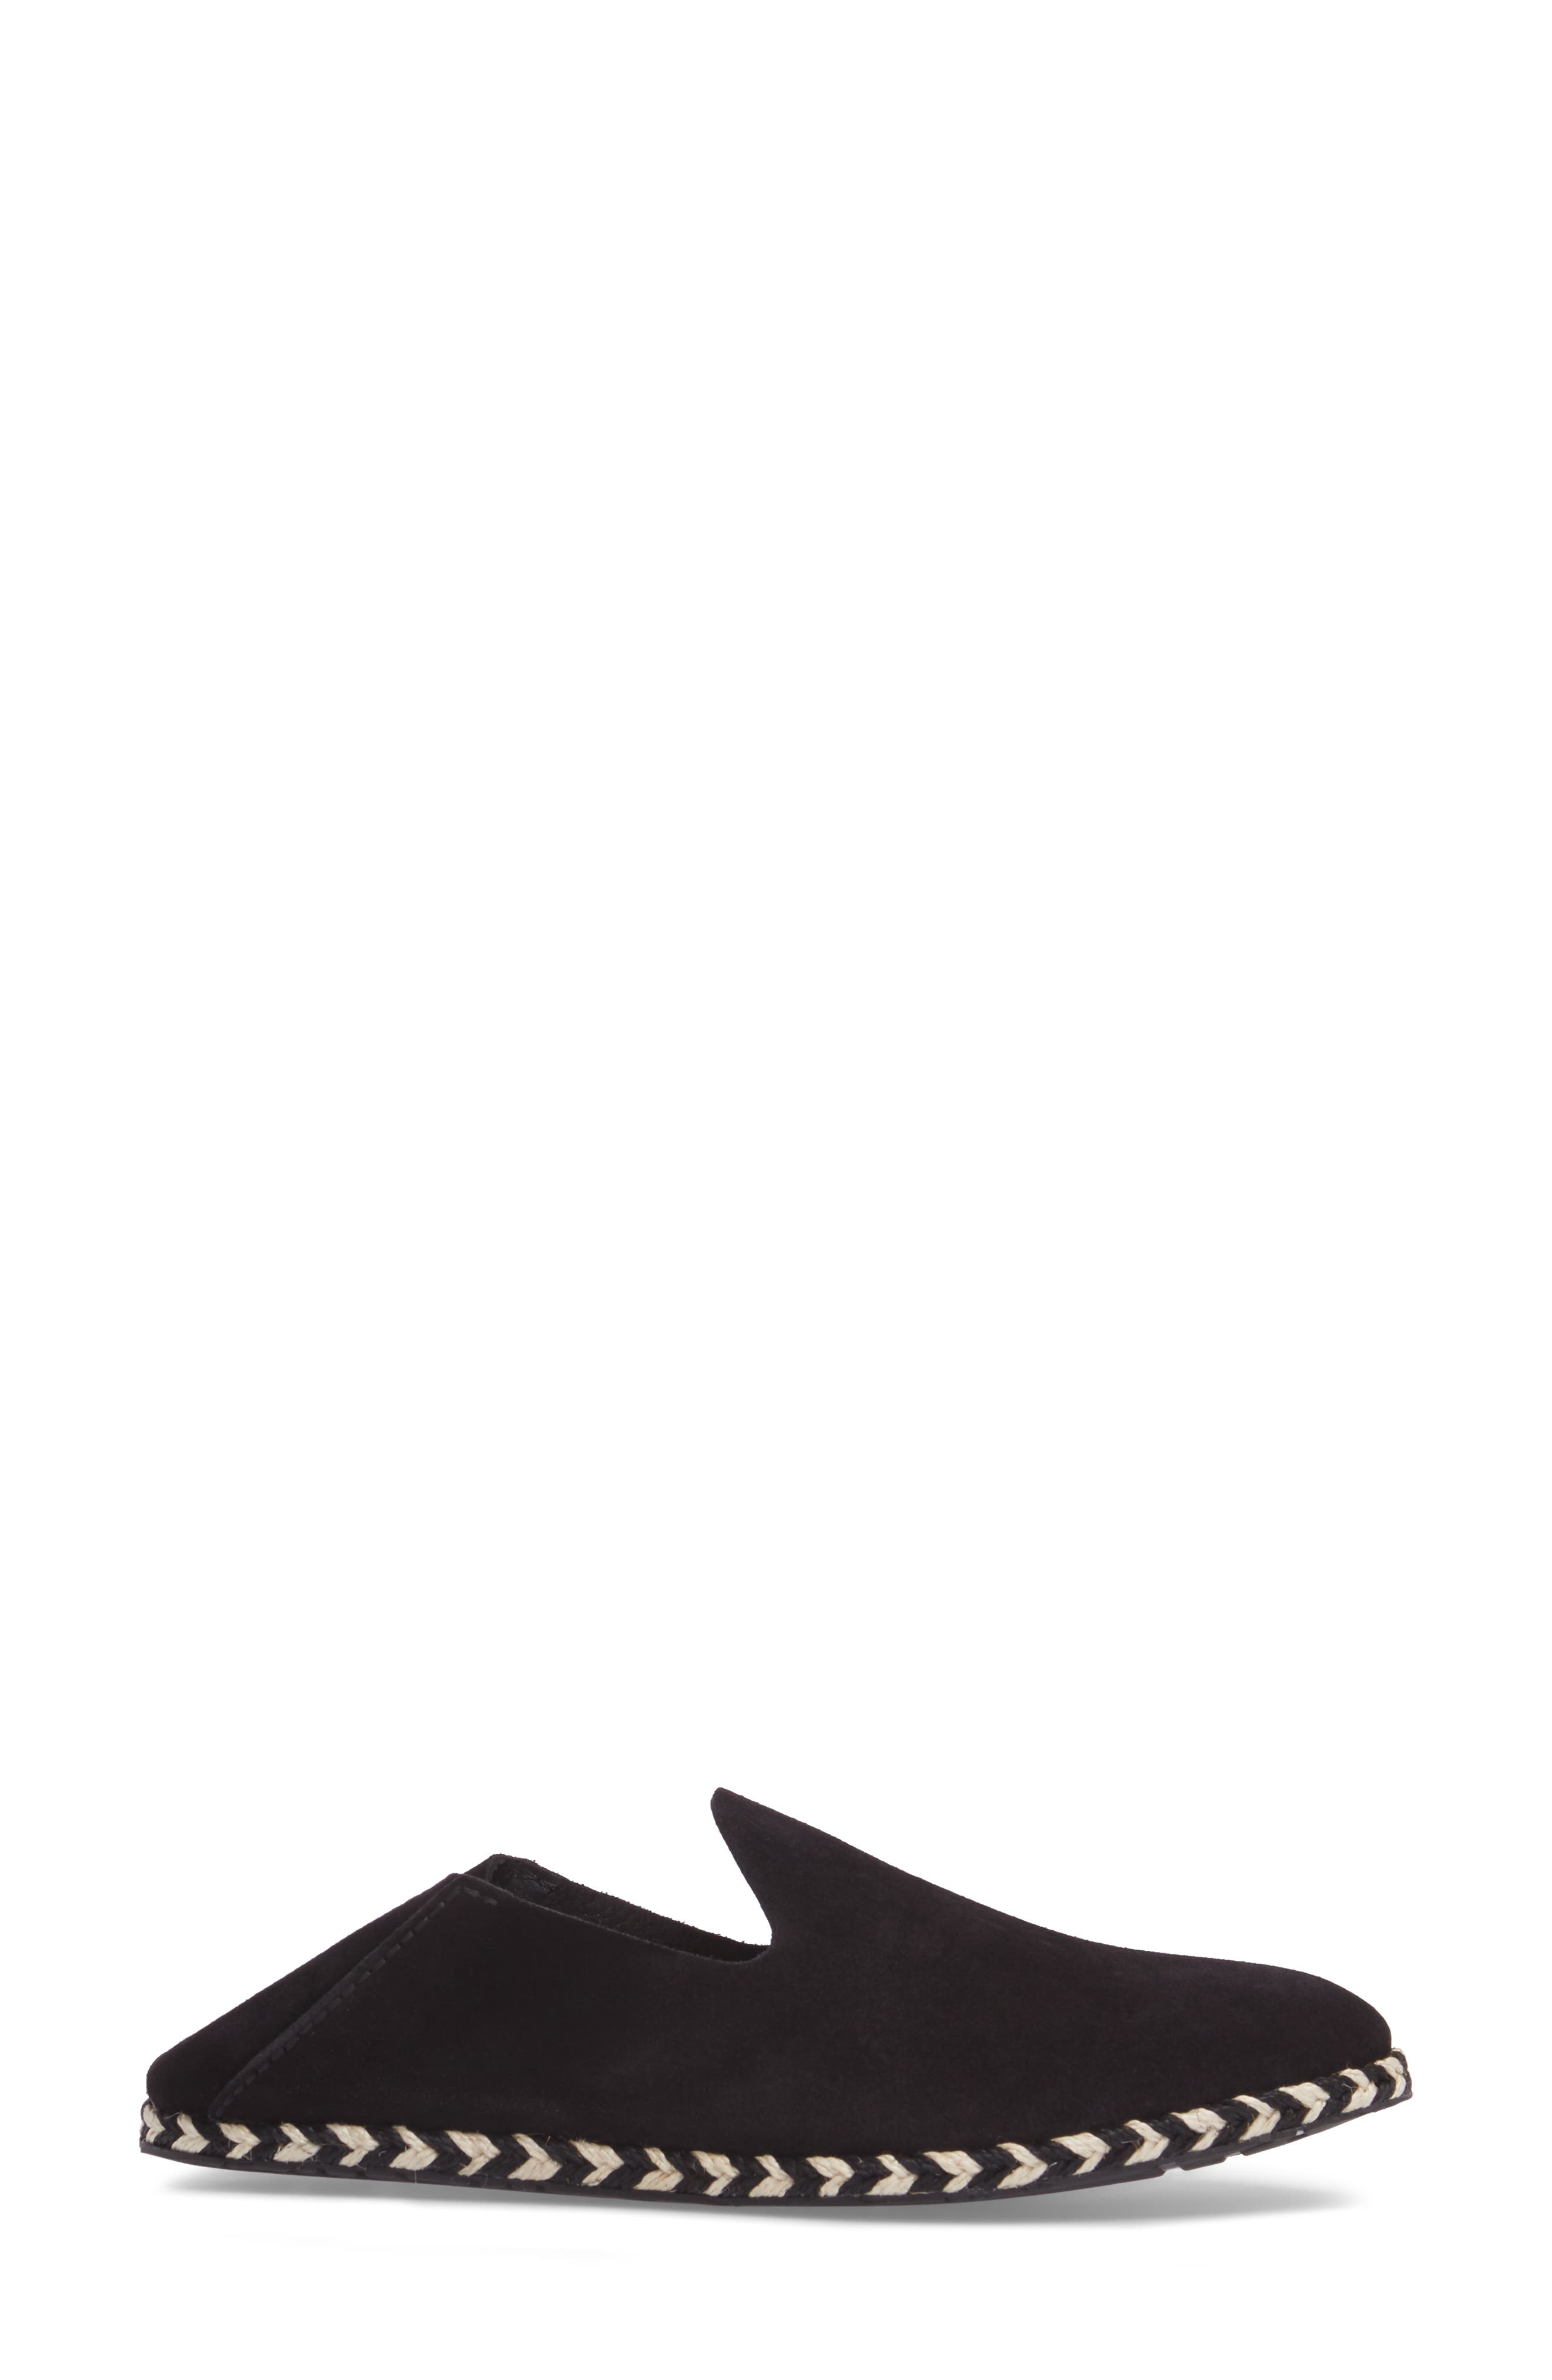 Yuli Convertible Woven Loafer,                             Alternate thumbnail 2, color,                             BLACK